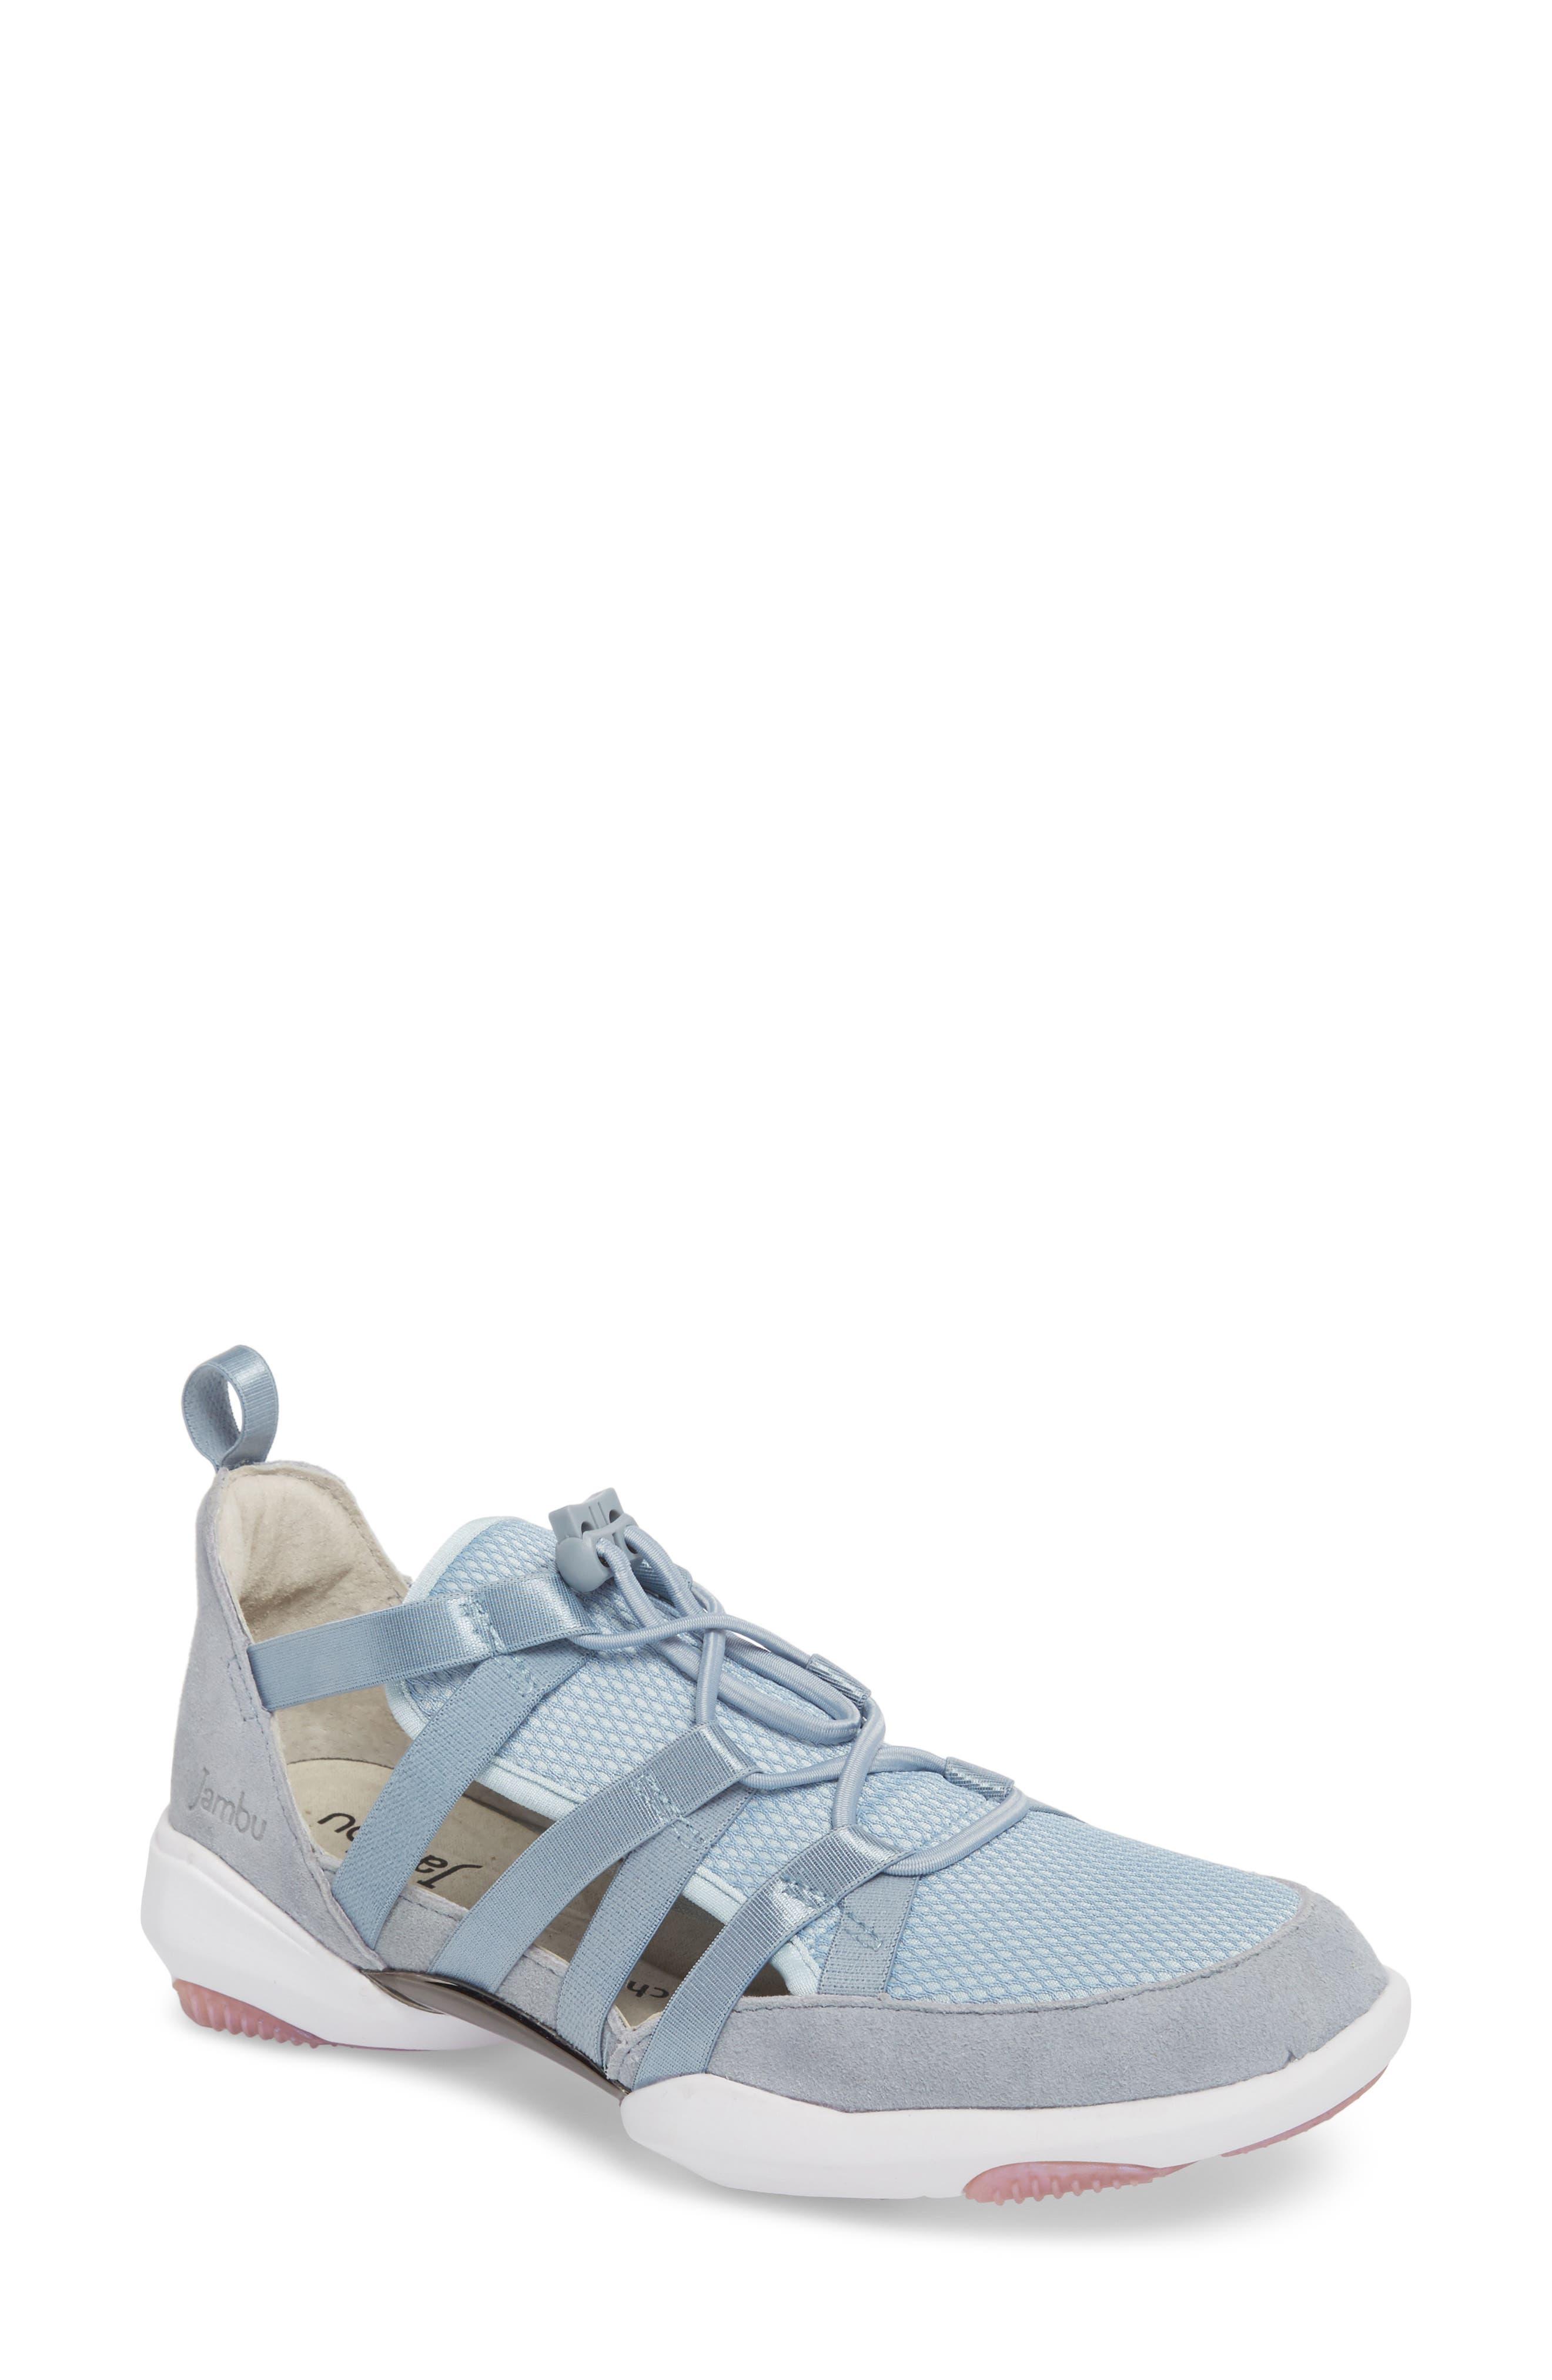 Azalea Sneaker,                             Main thumbnail 1, color,                             BLUE LEATHER